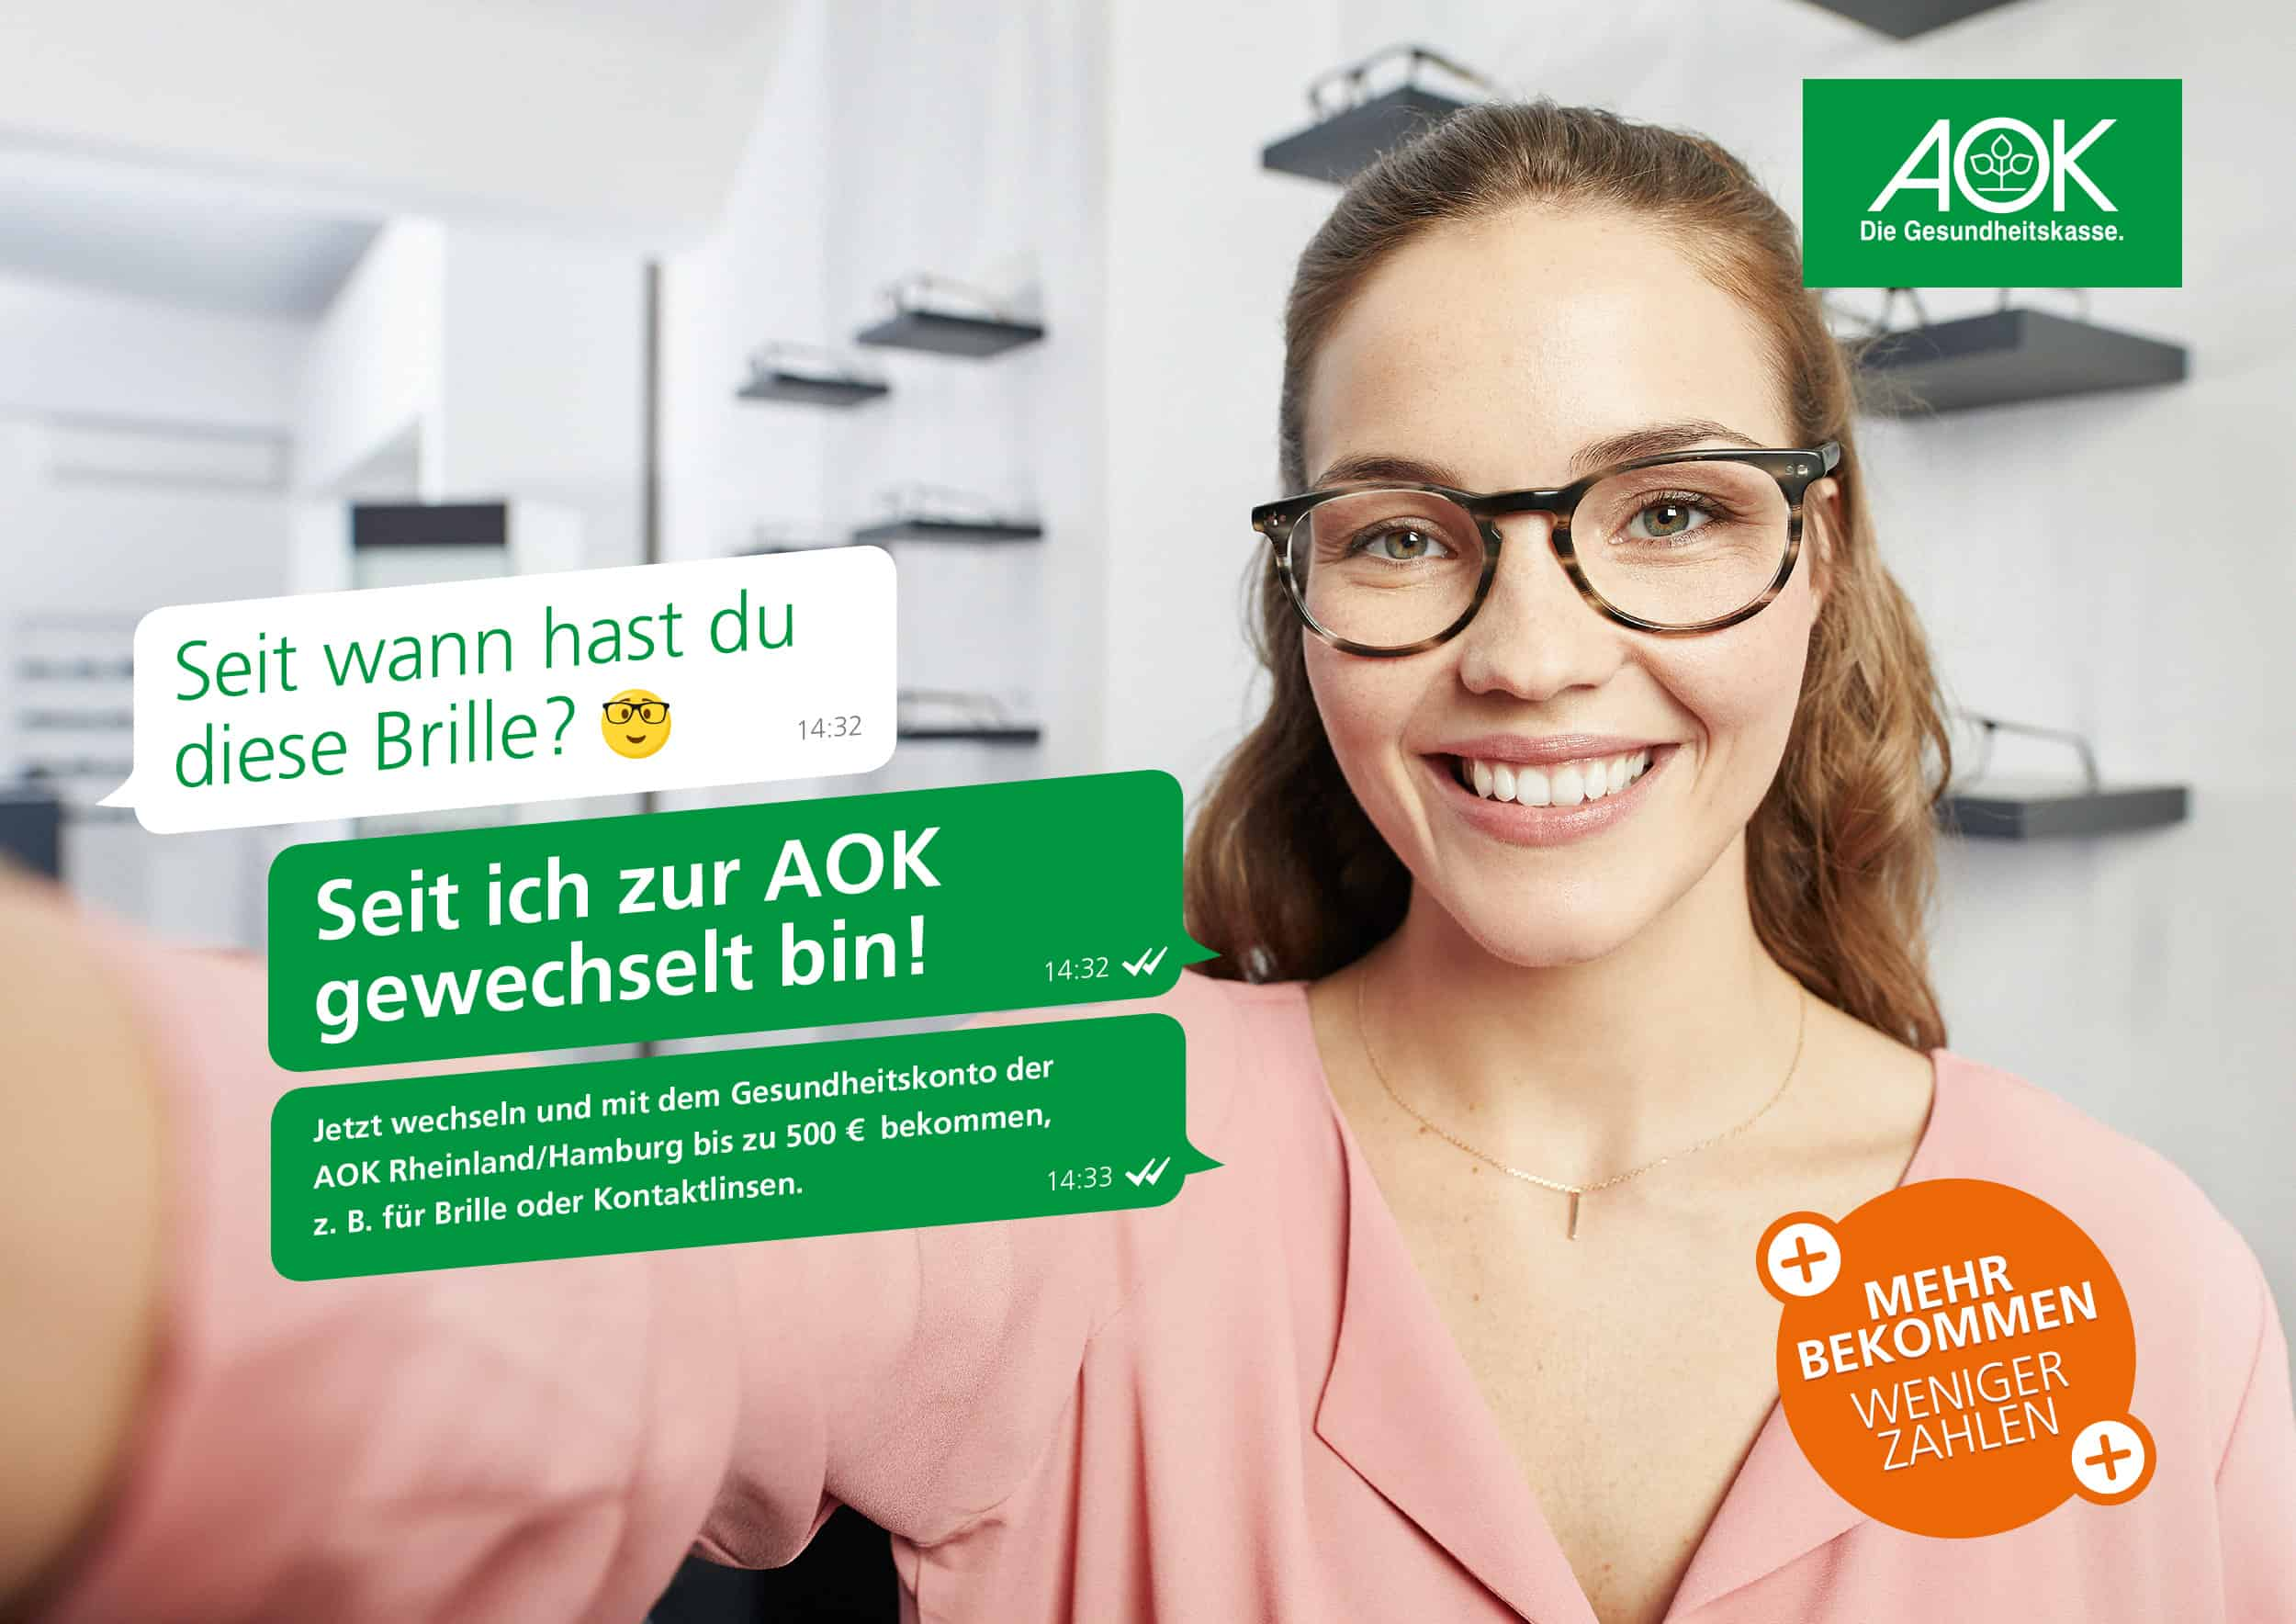 studio-ignatov-aok-jahreswechsel-brille-quer